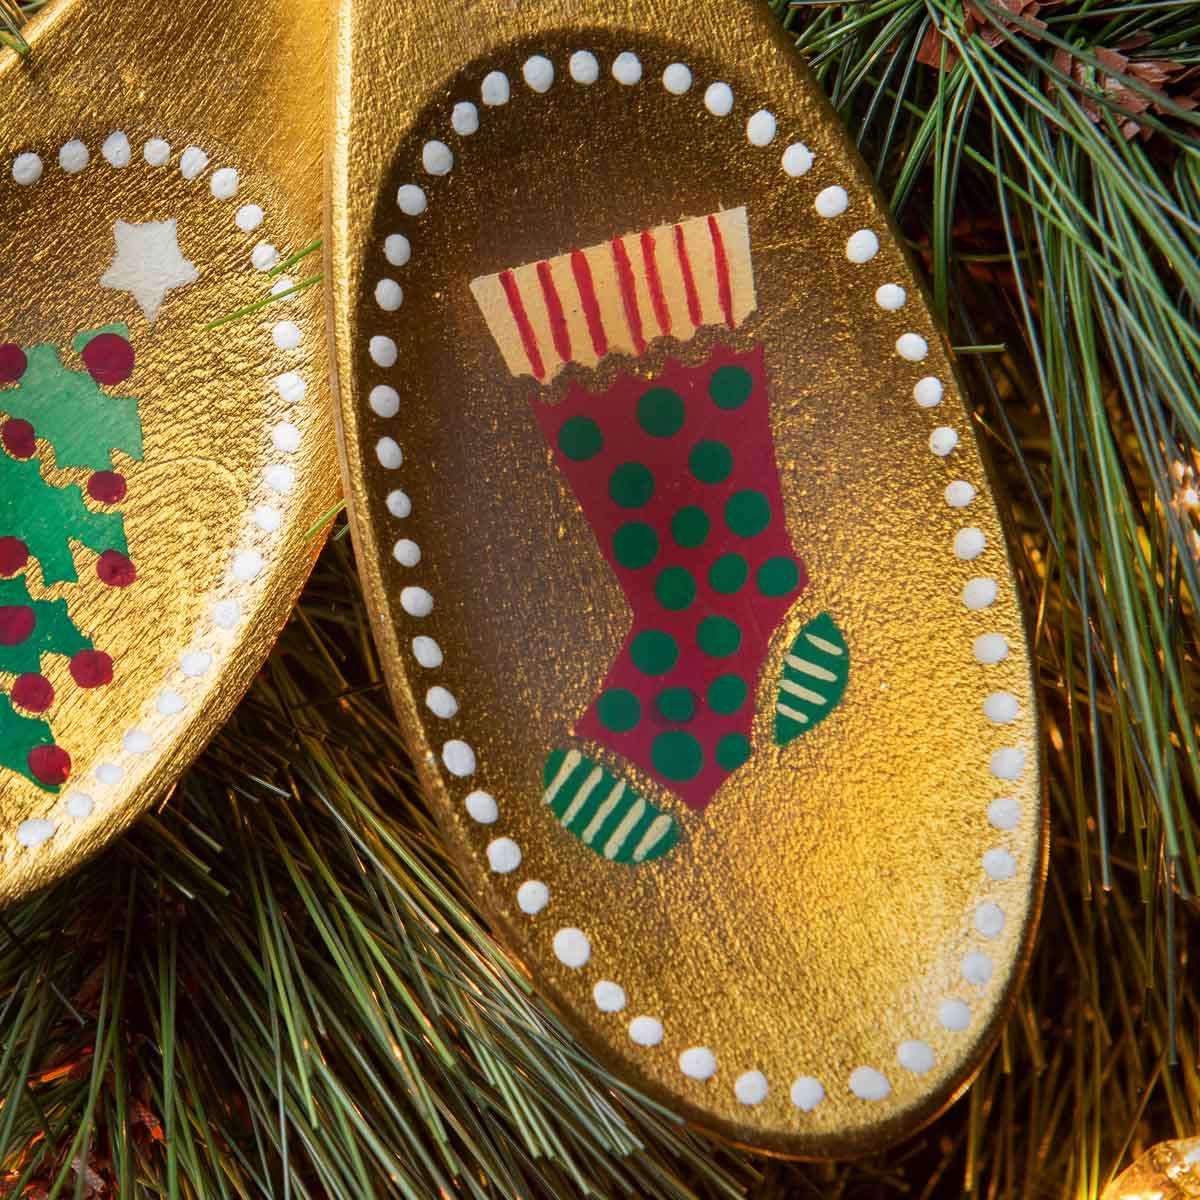 Wooden Spoon Ornaments